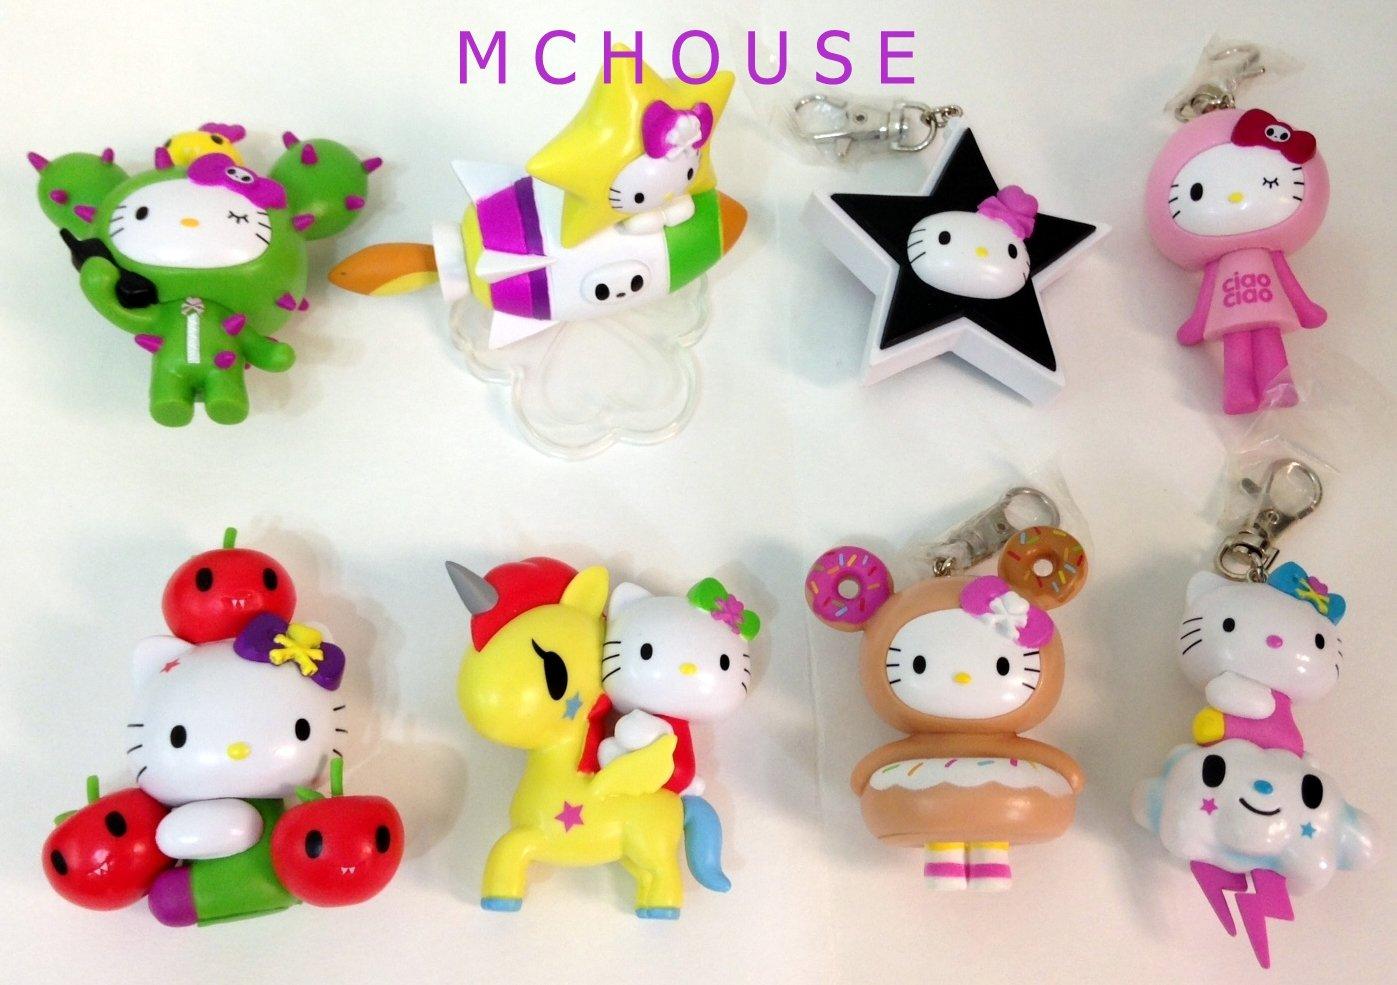 7-11 HK Sanrio Hello Kitty Tokidoki Wonderland Figurine 8pcs set